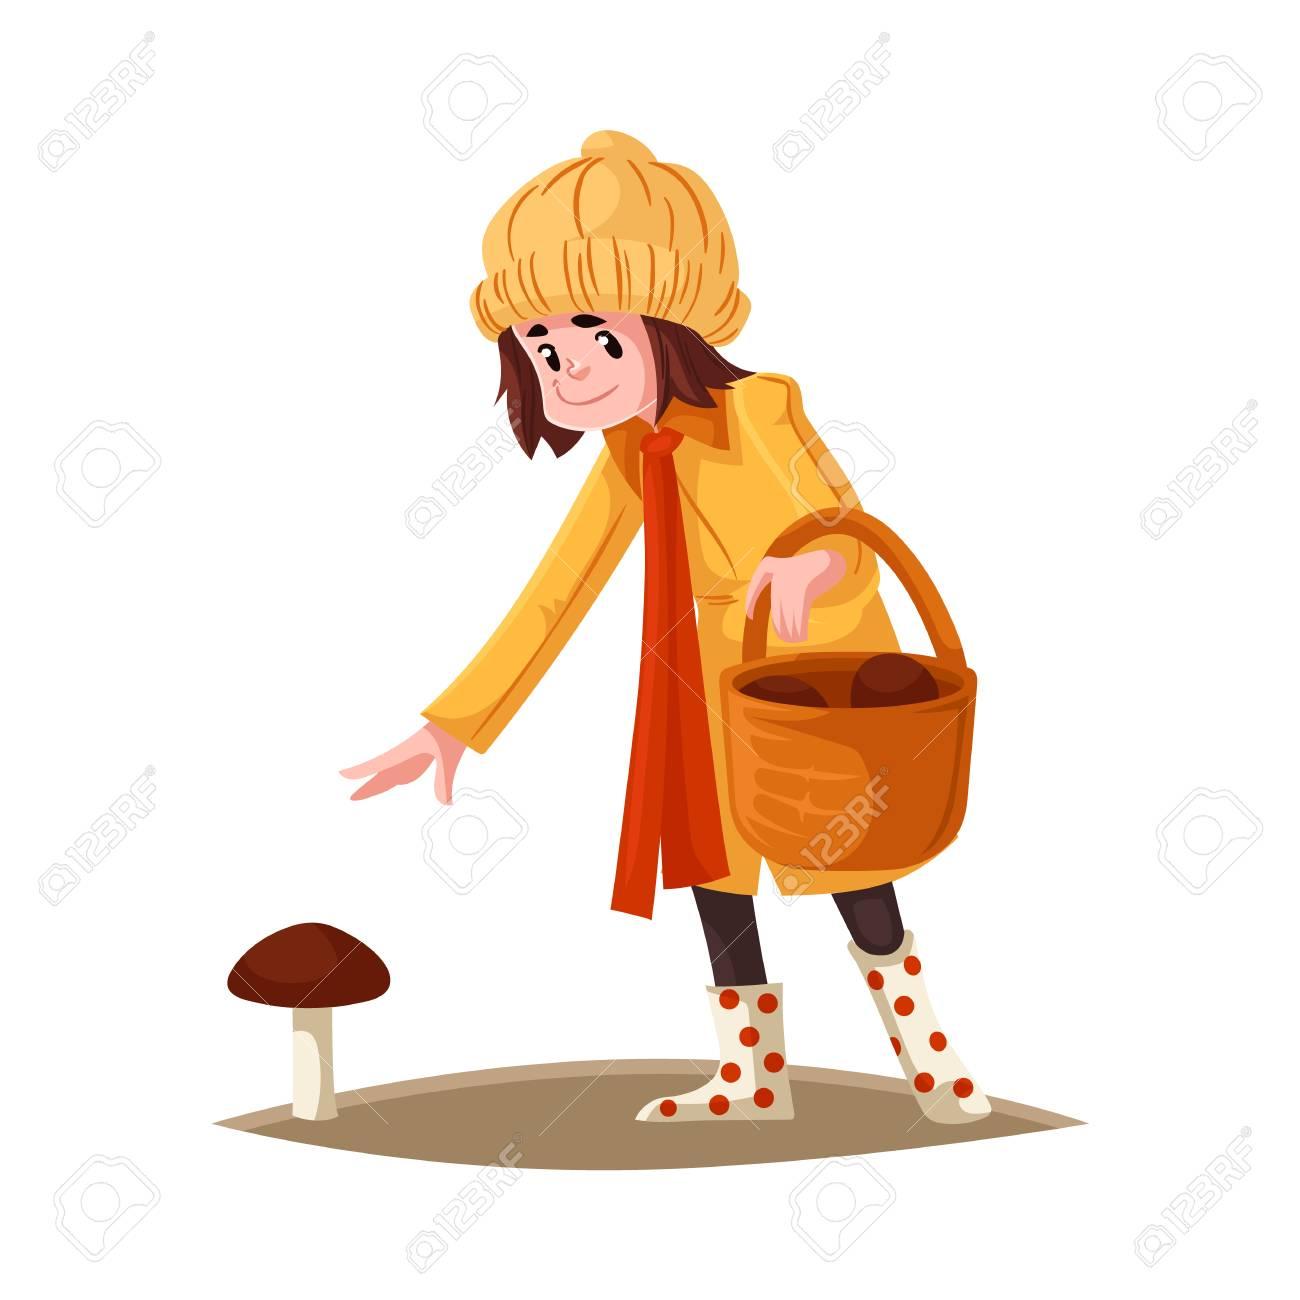 Cartoon Girl Kid In Autumn Outdoor Clothing Collecting Mushrooms